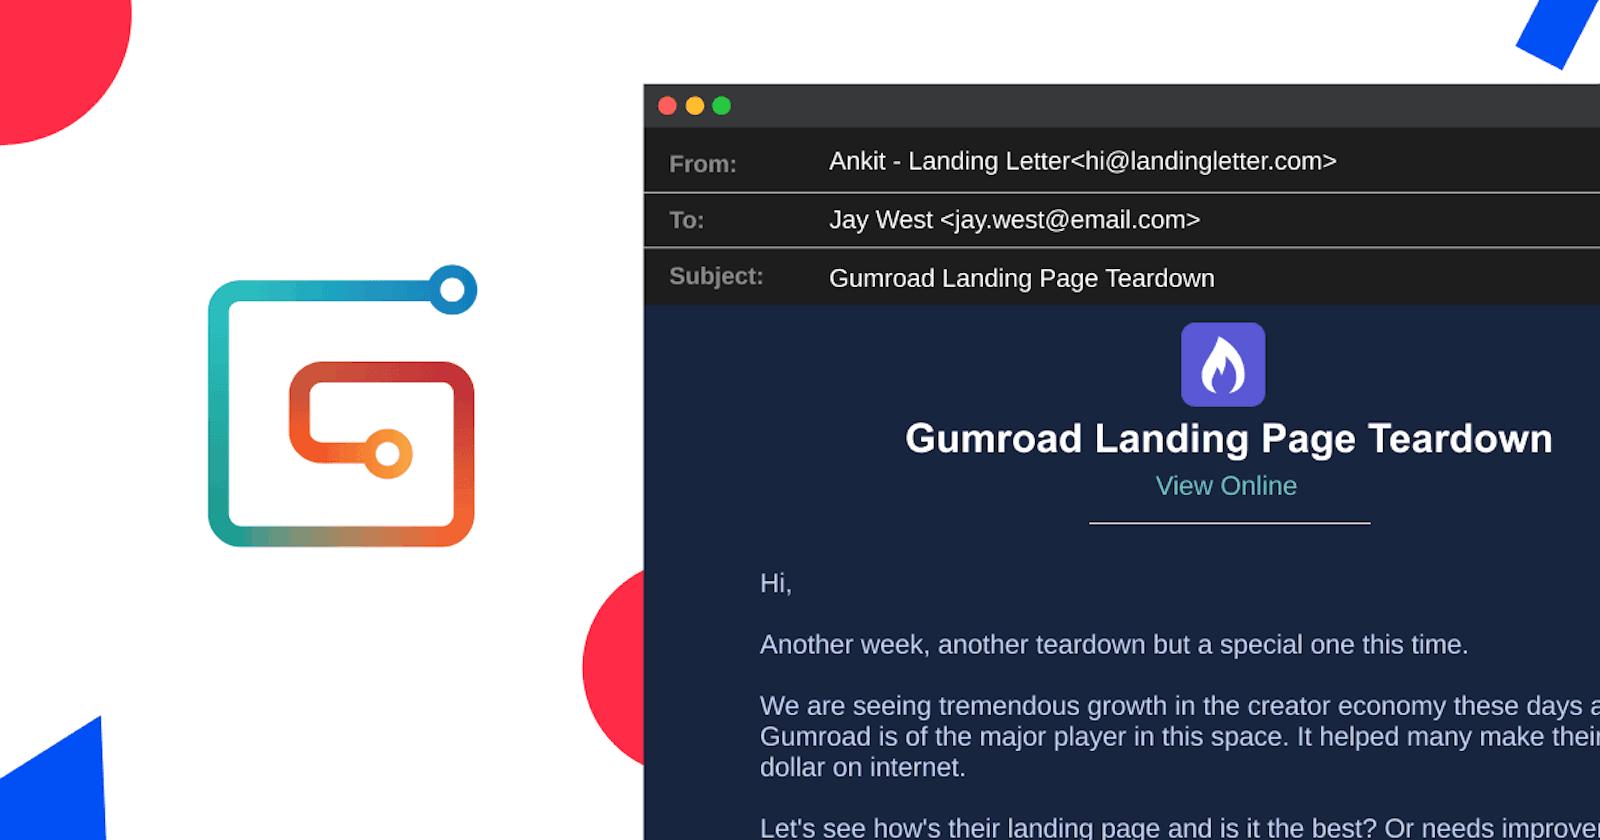 Gumroad Landing Page Teardown